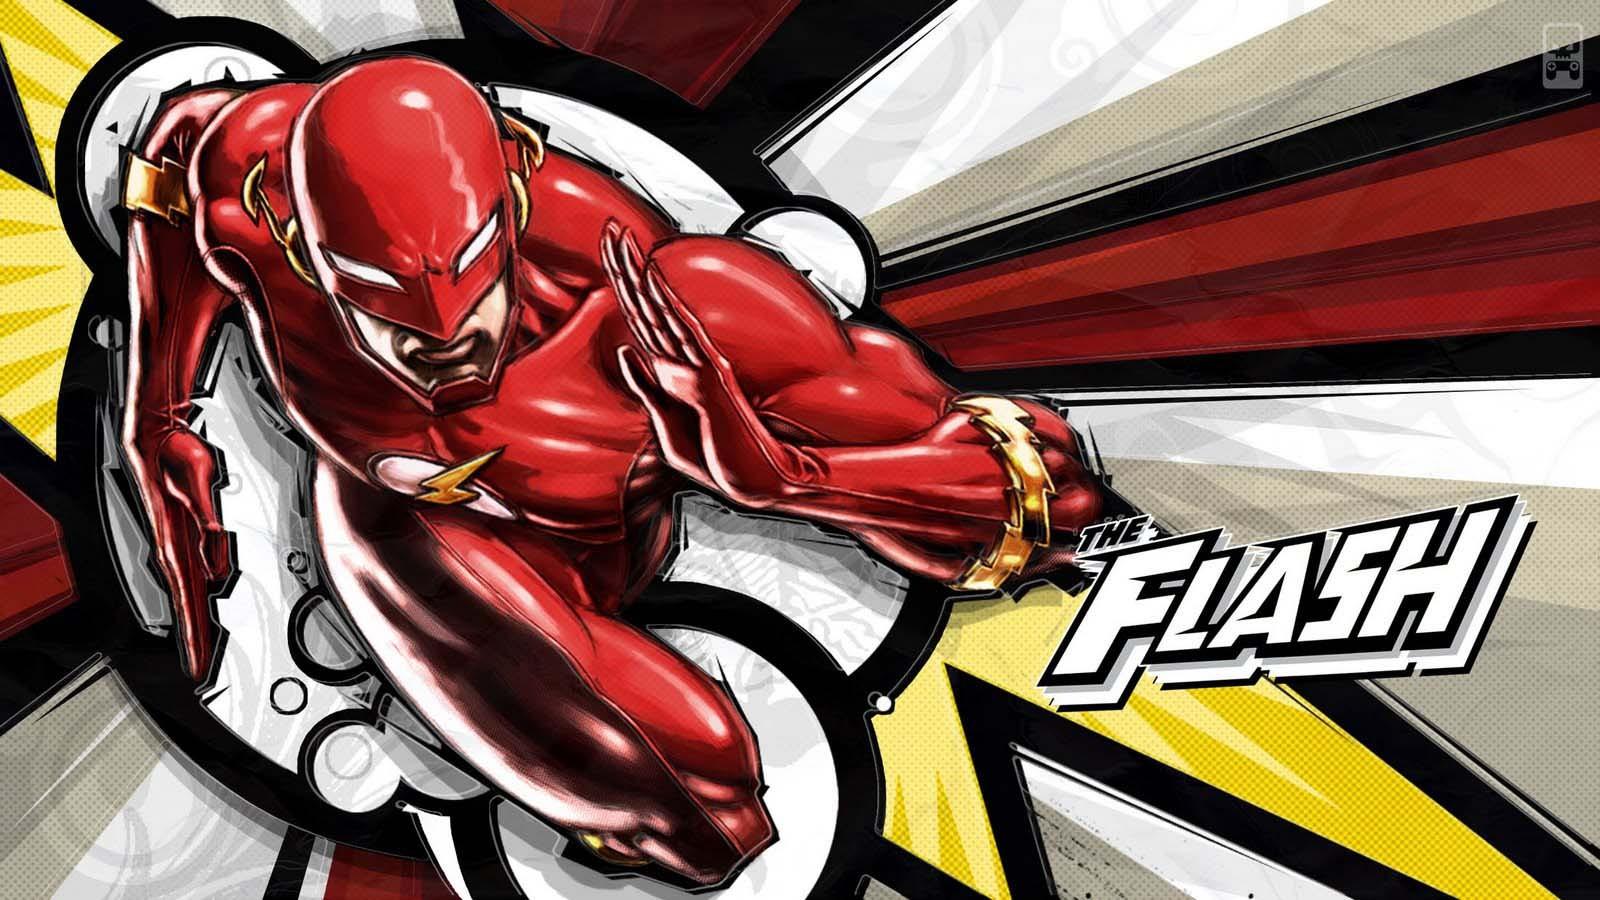 General 1600x900 The Flash logo watermarked comics